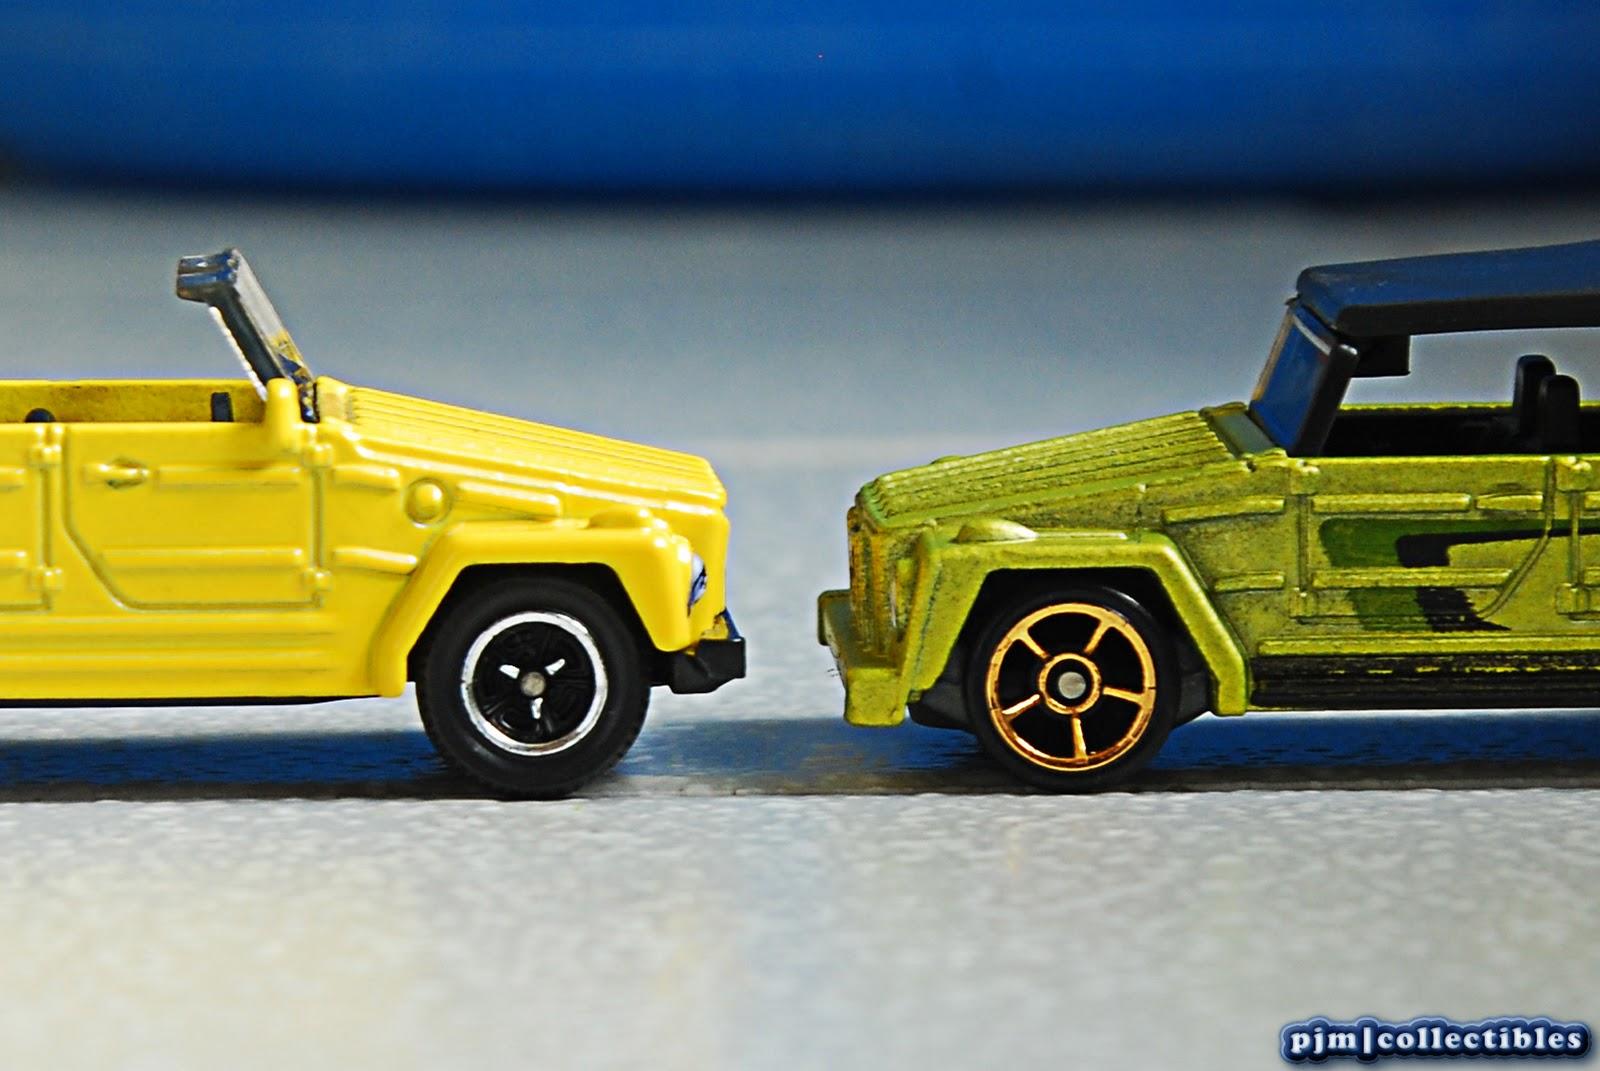 http://3.bp.blogspot.com/-L0gh5L2Fh84/TtXD04_O6xI/AAAAAAAAAOo/ZV6thUuhHFw/s1600/twin+thing.jpg